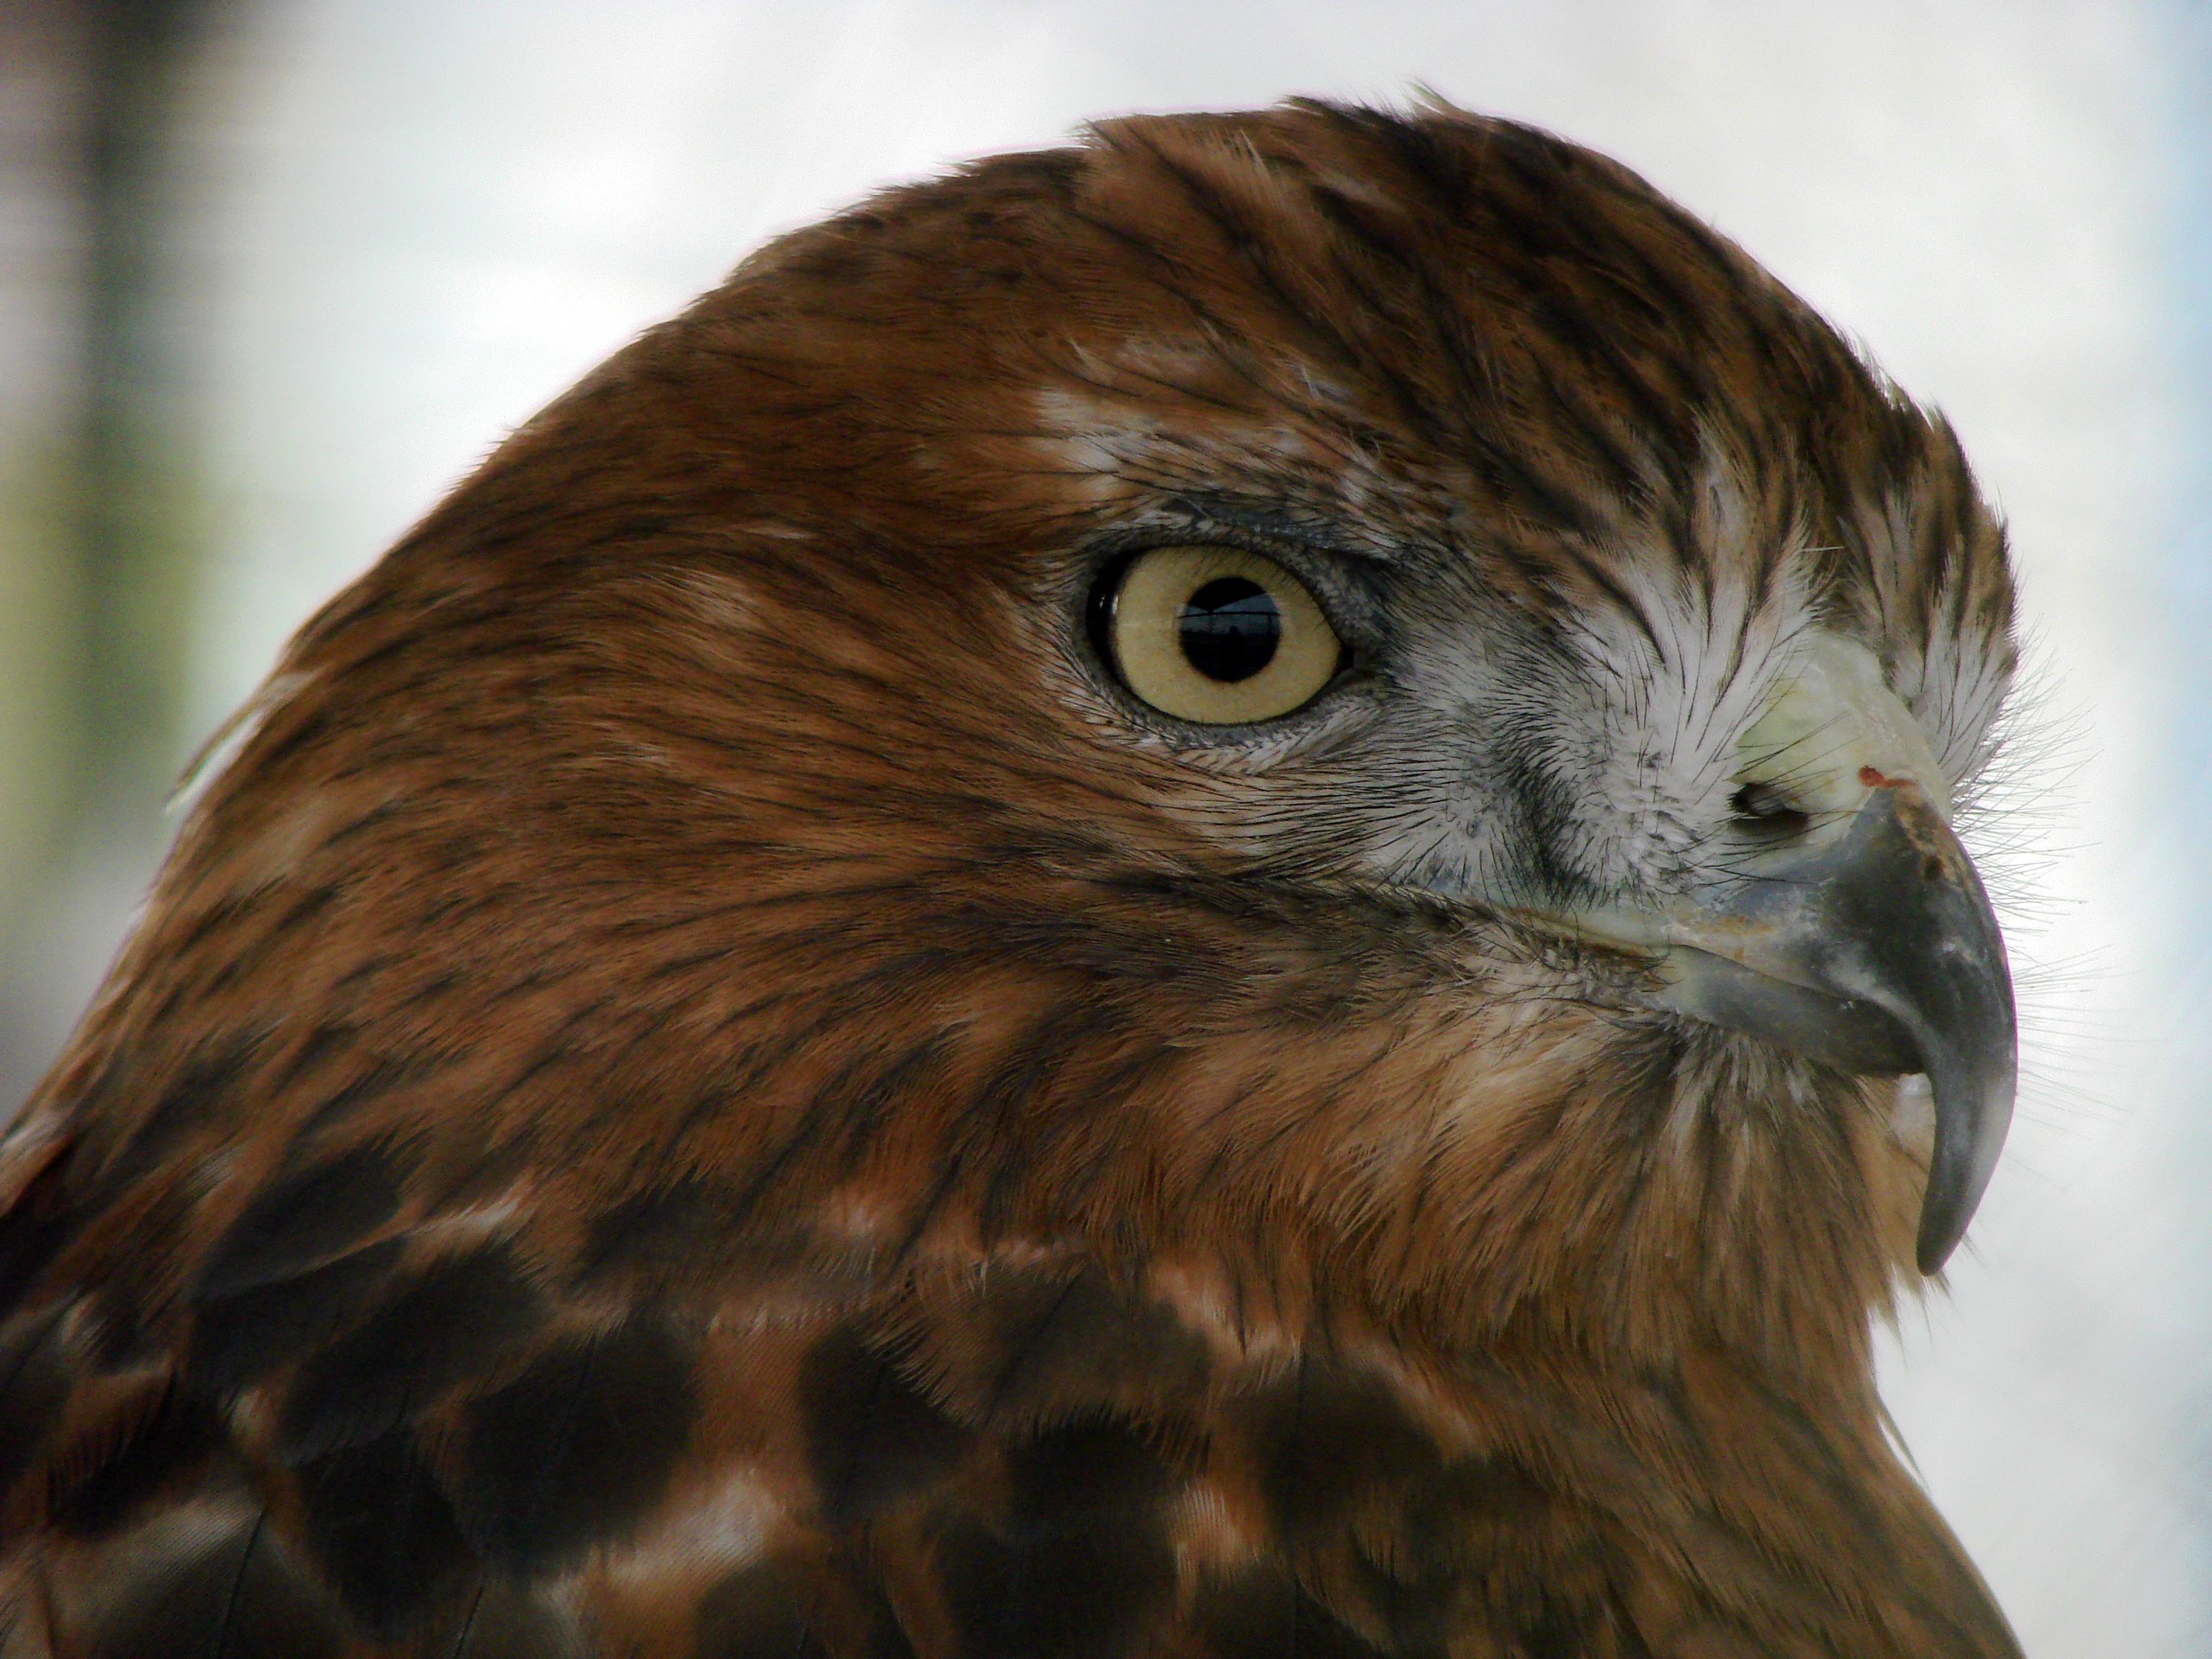 File:Eagle عقاب 06.jpg - Wikimedia Commons